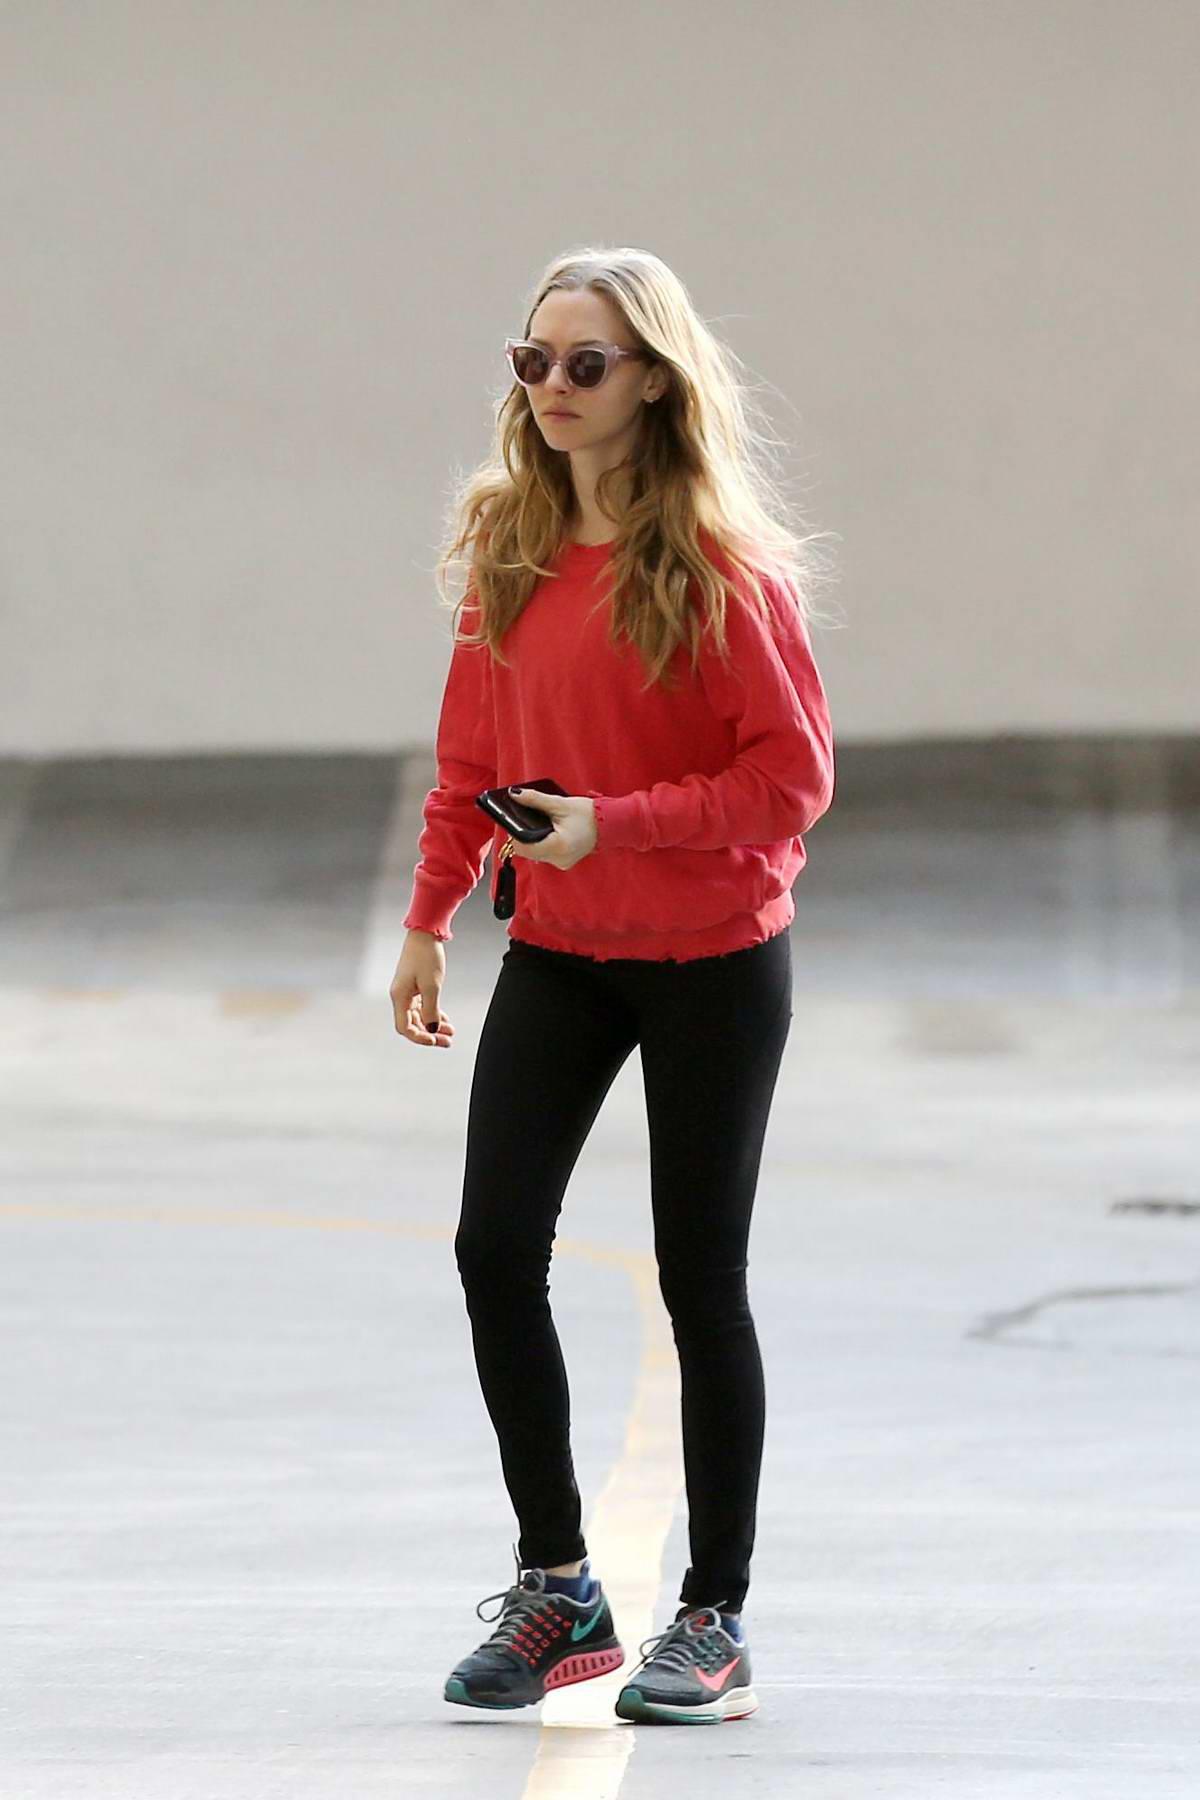 Amanda Seyfried wears red sweatshirt and black leggings as she stops by a FedEx Kinko's store in West Hollywood, California